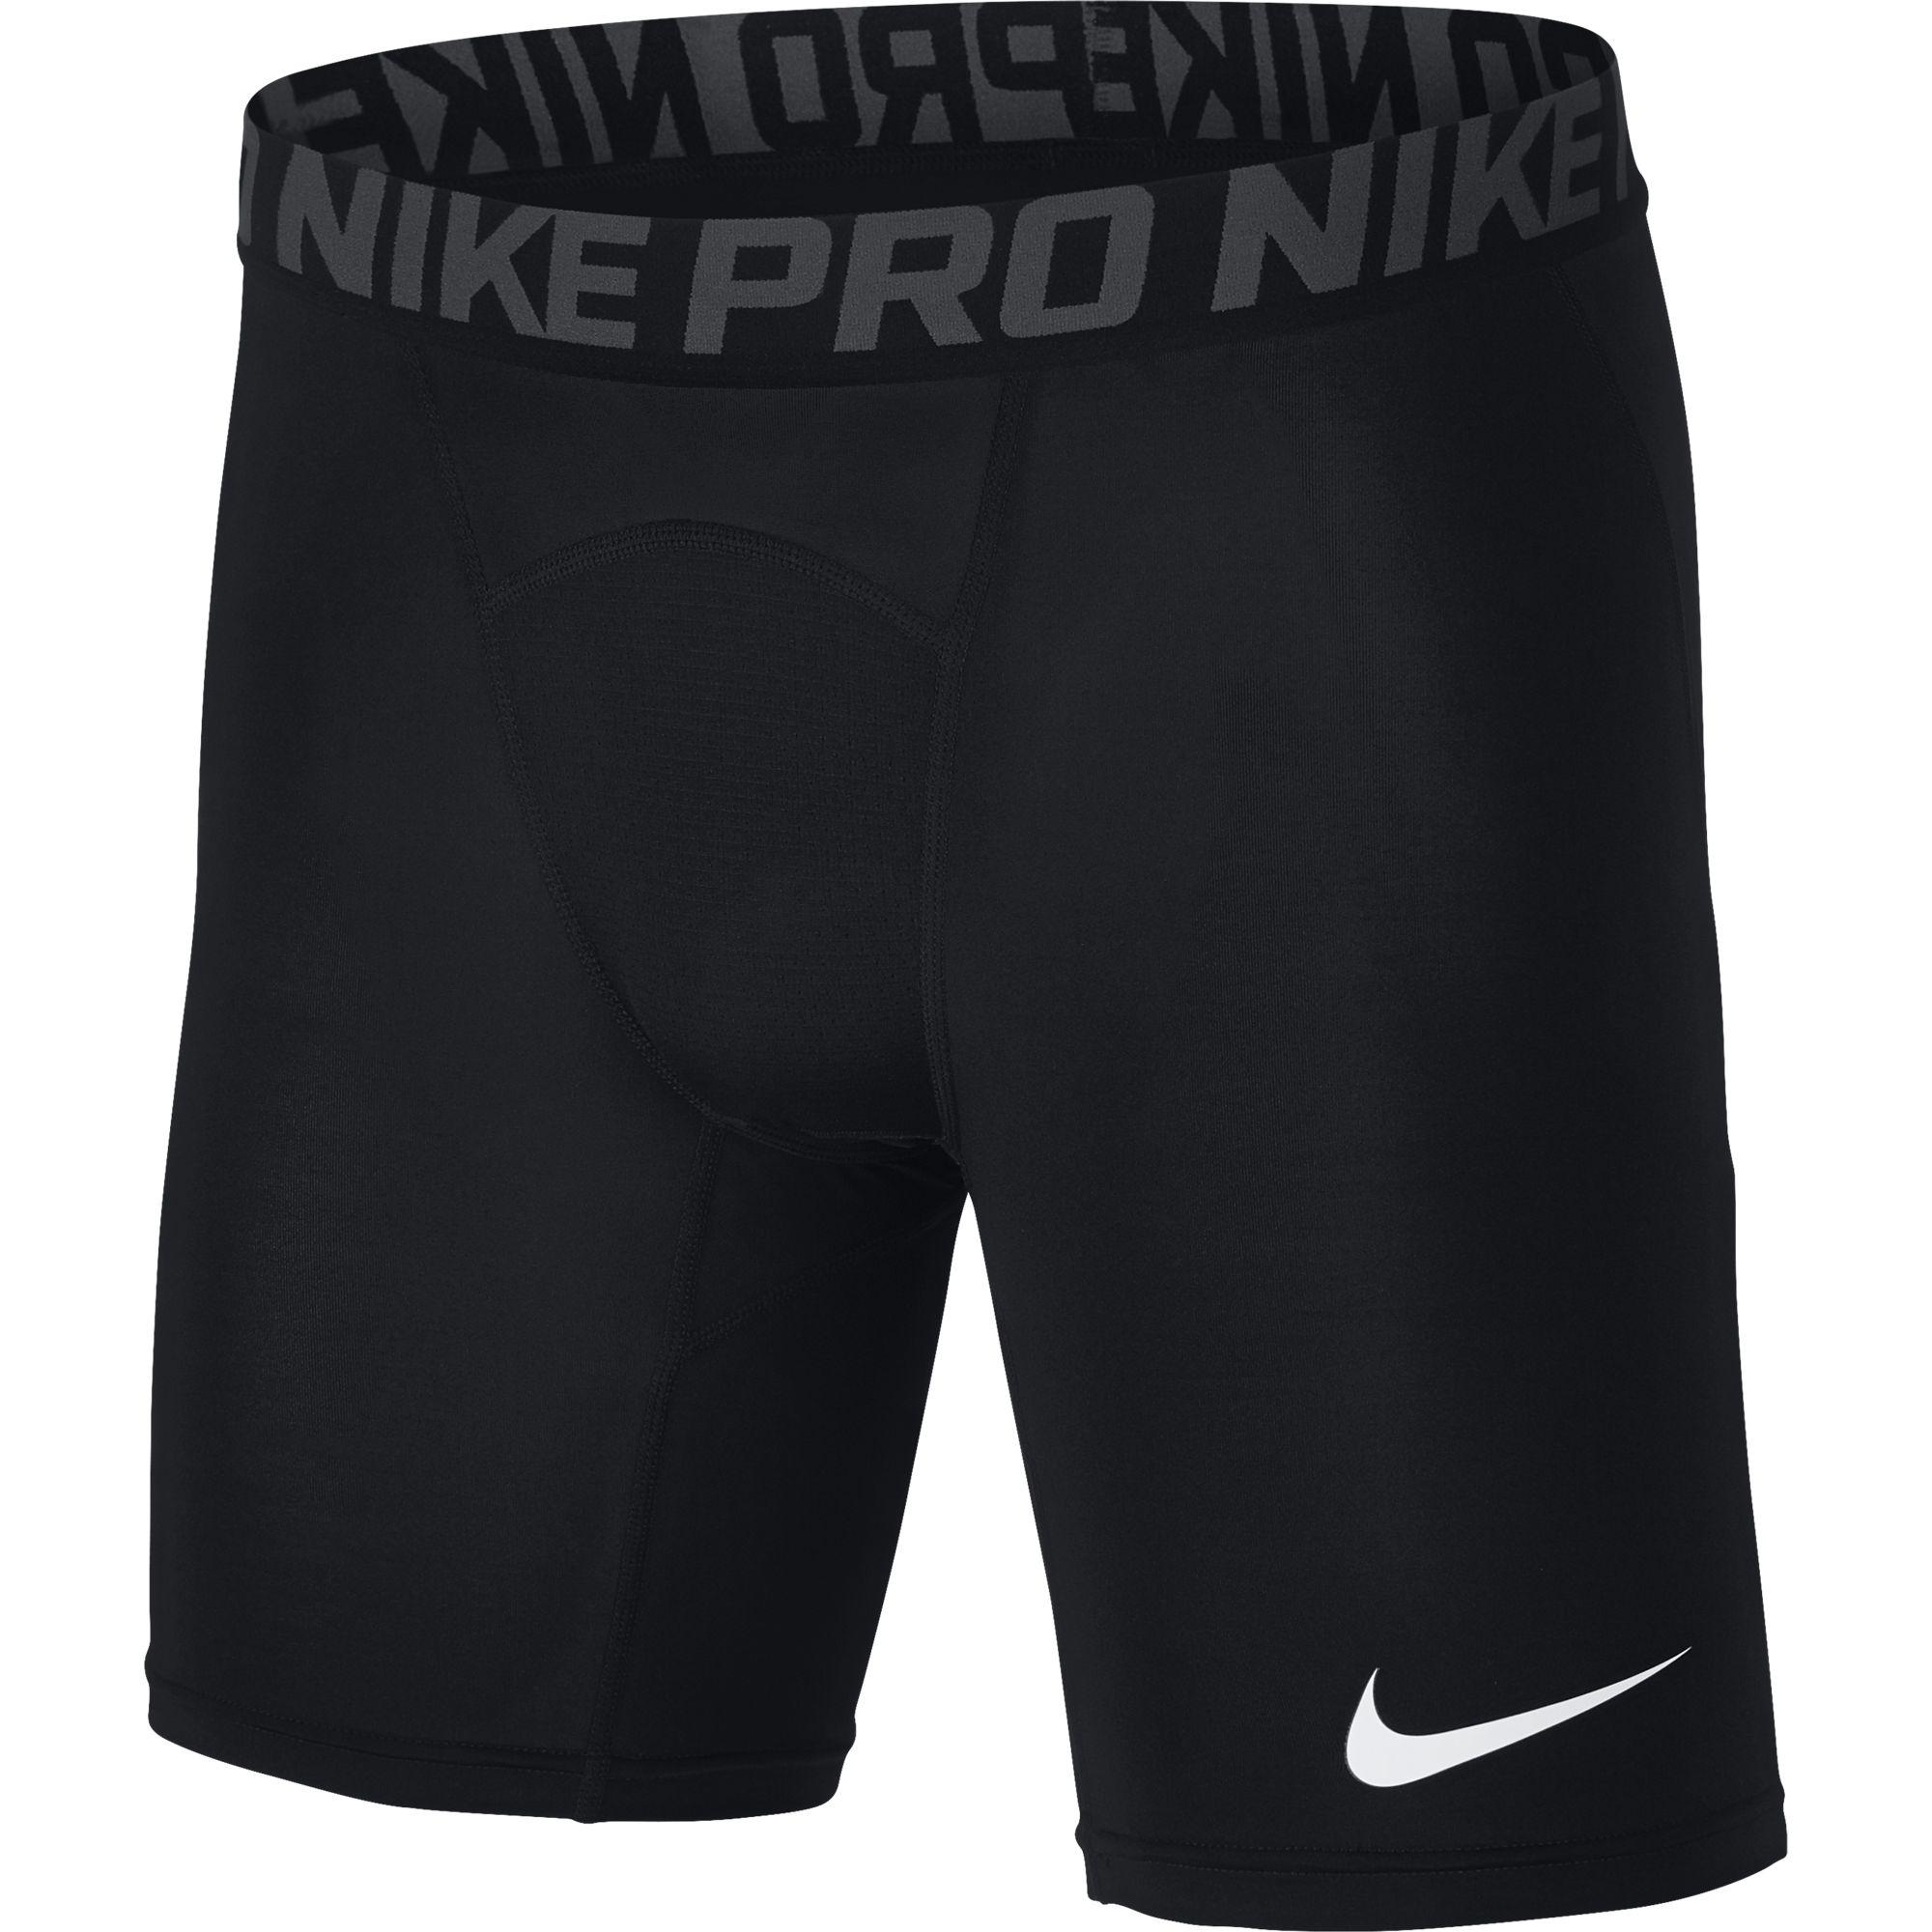 Men's Pro Short, Black, swatch